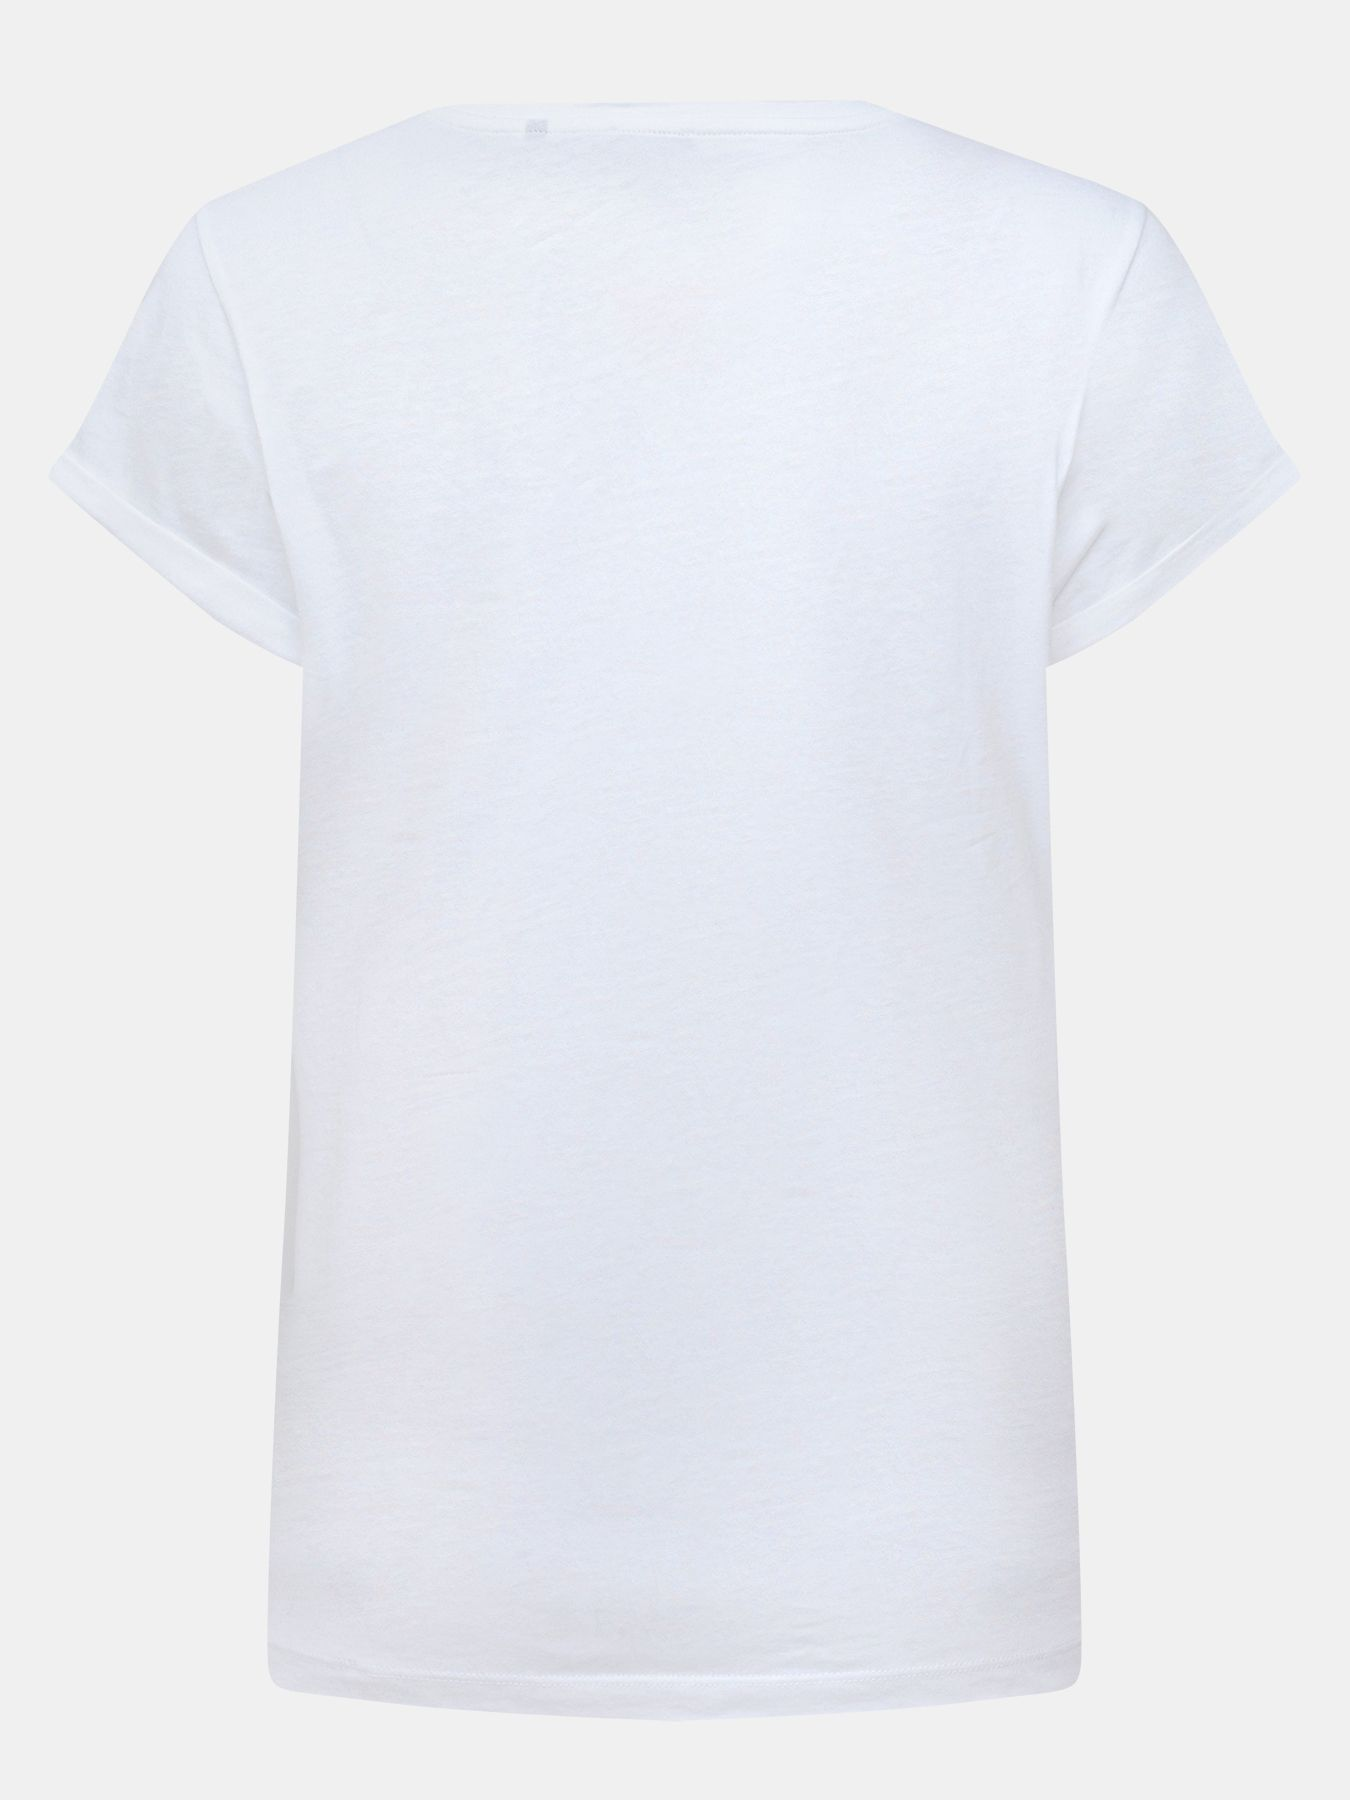 Фуфайка (футболка) Marella Sport Футболка Licence